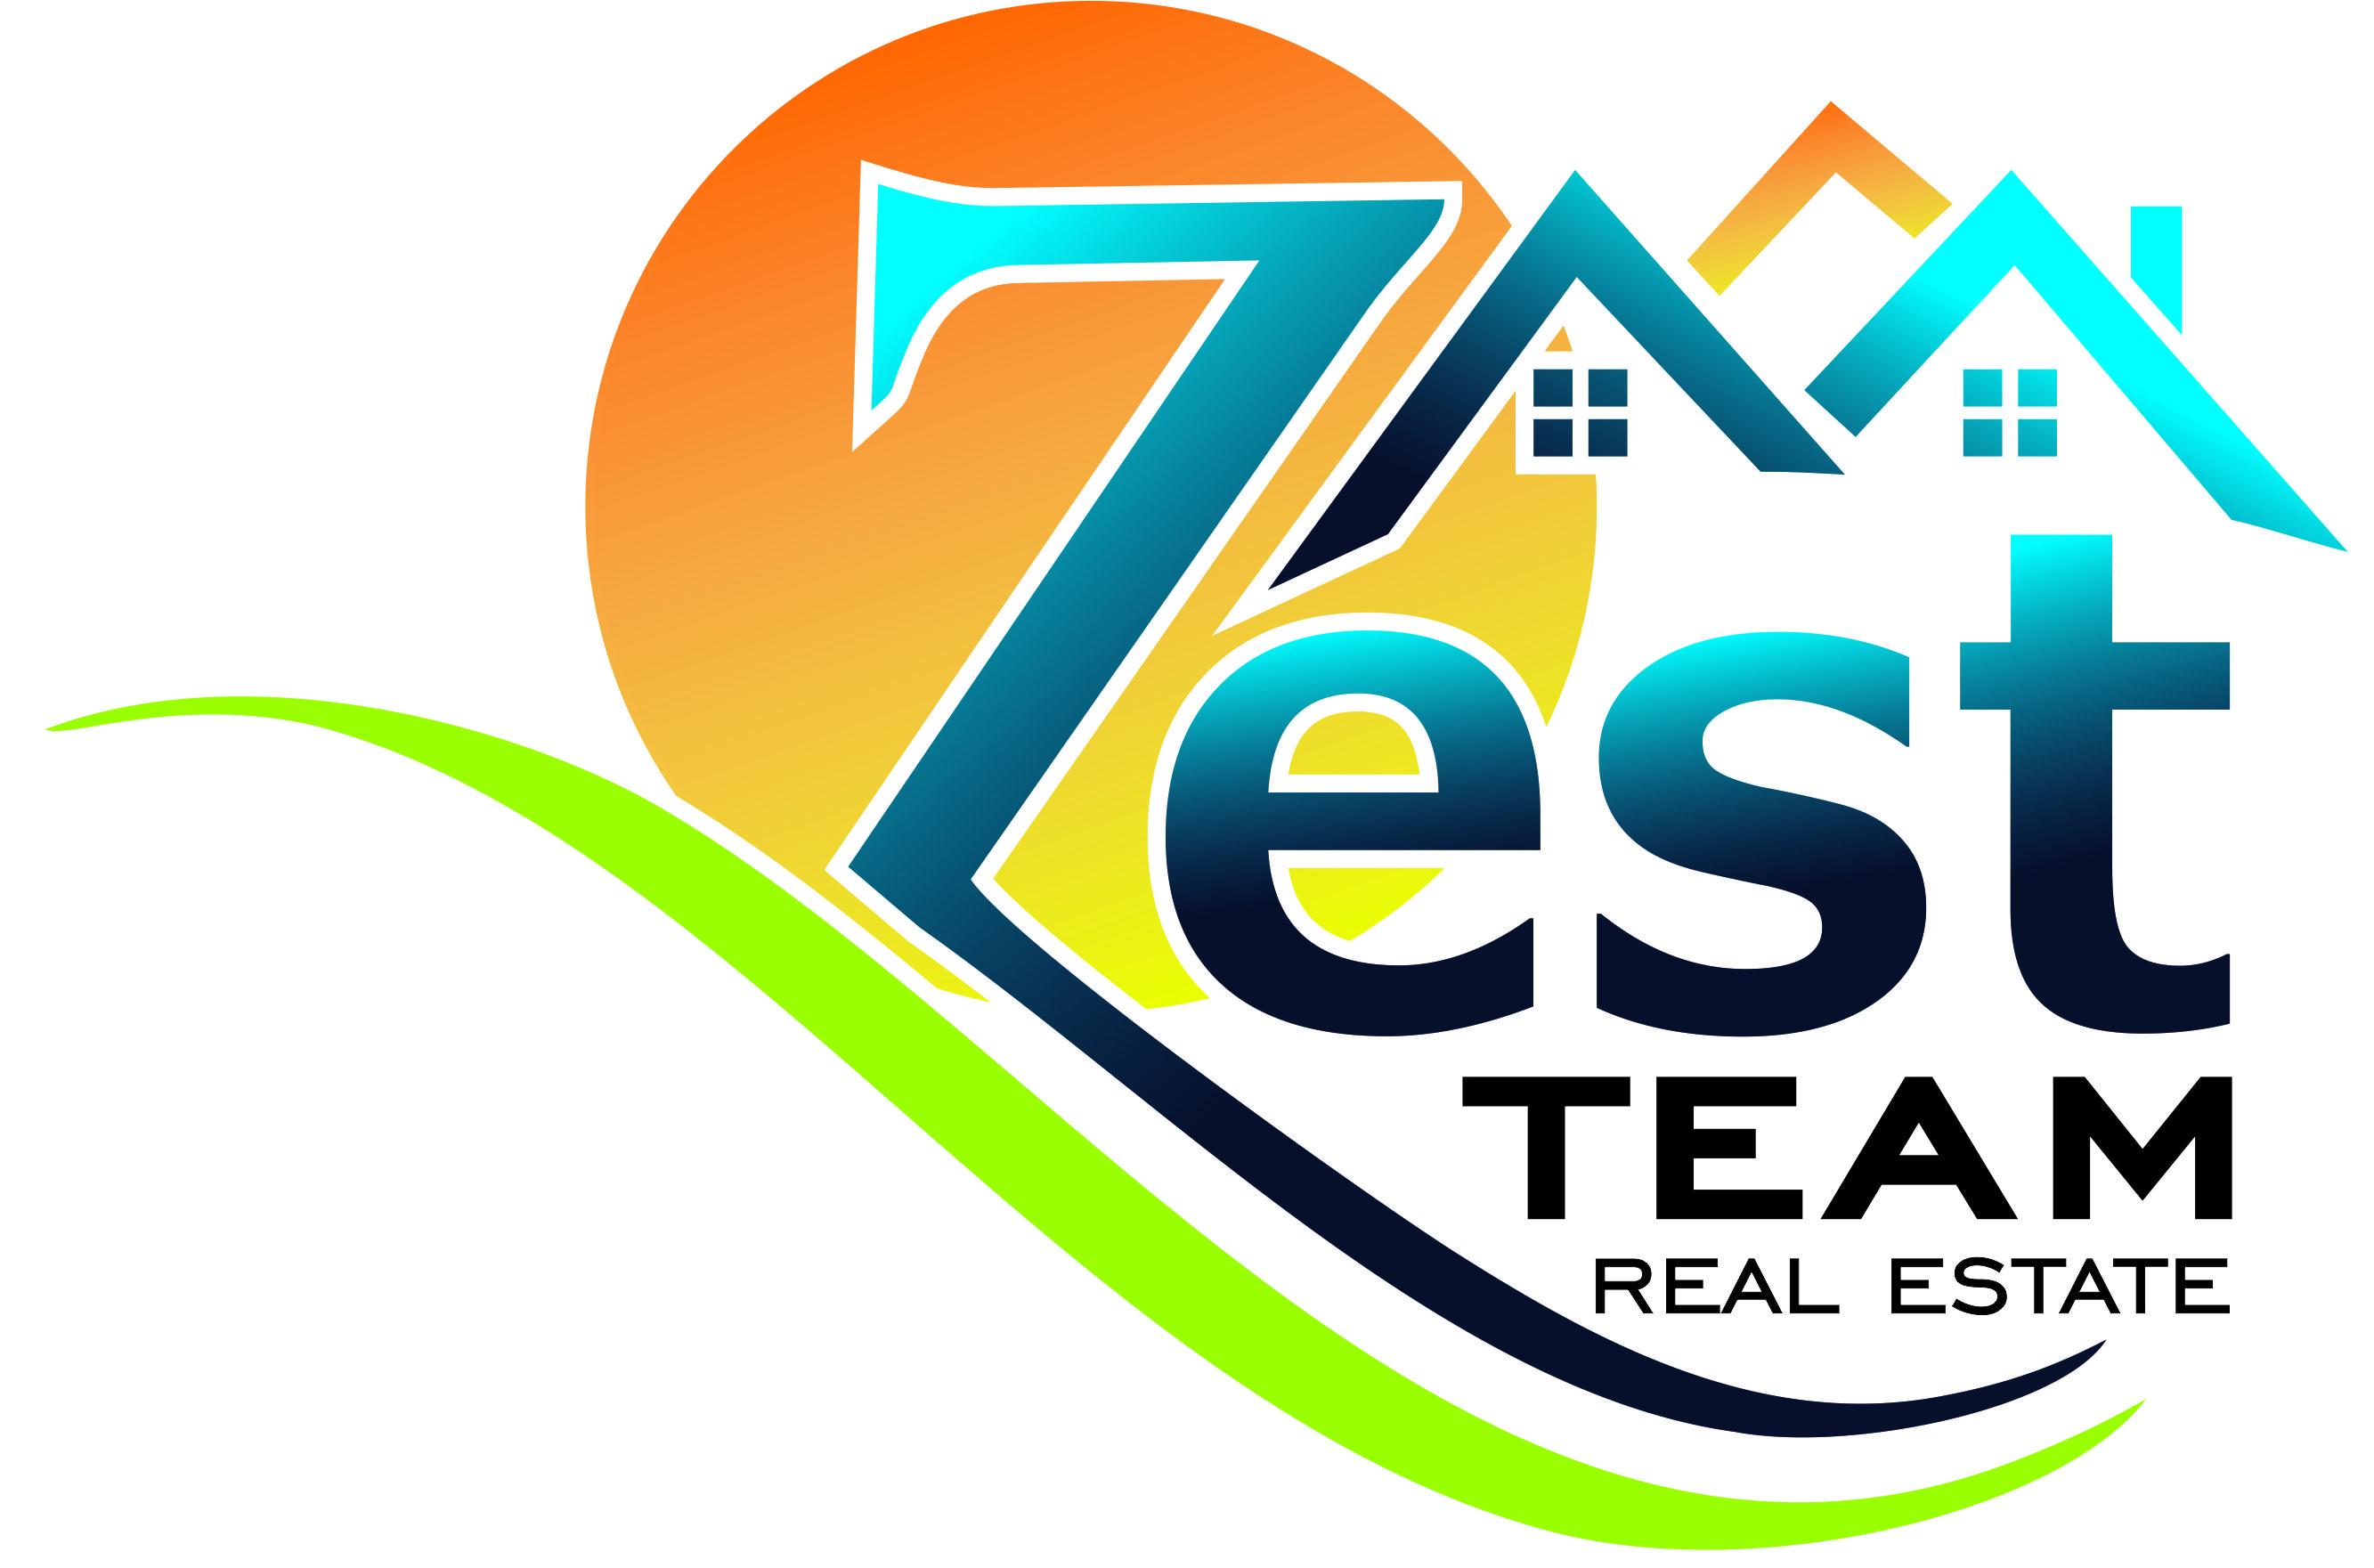 Zest Team At Future Home Realty   Tampa Florida Real Estate   Tampa Florida Realtor   New Homes for Sale   Tampa Florida